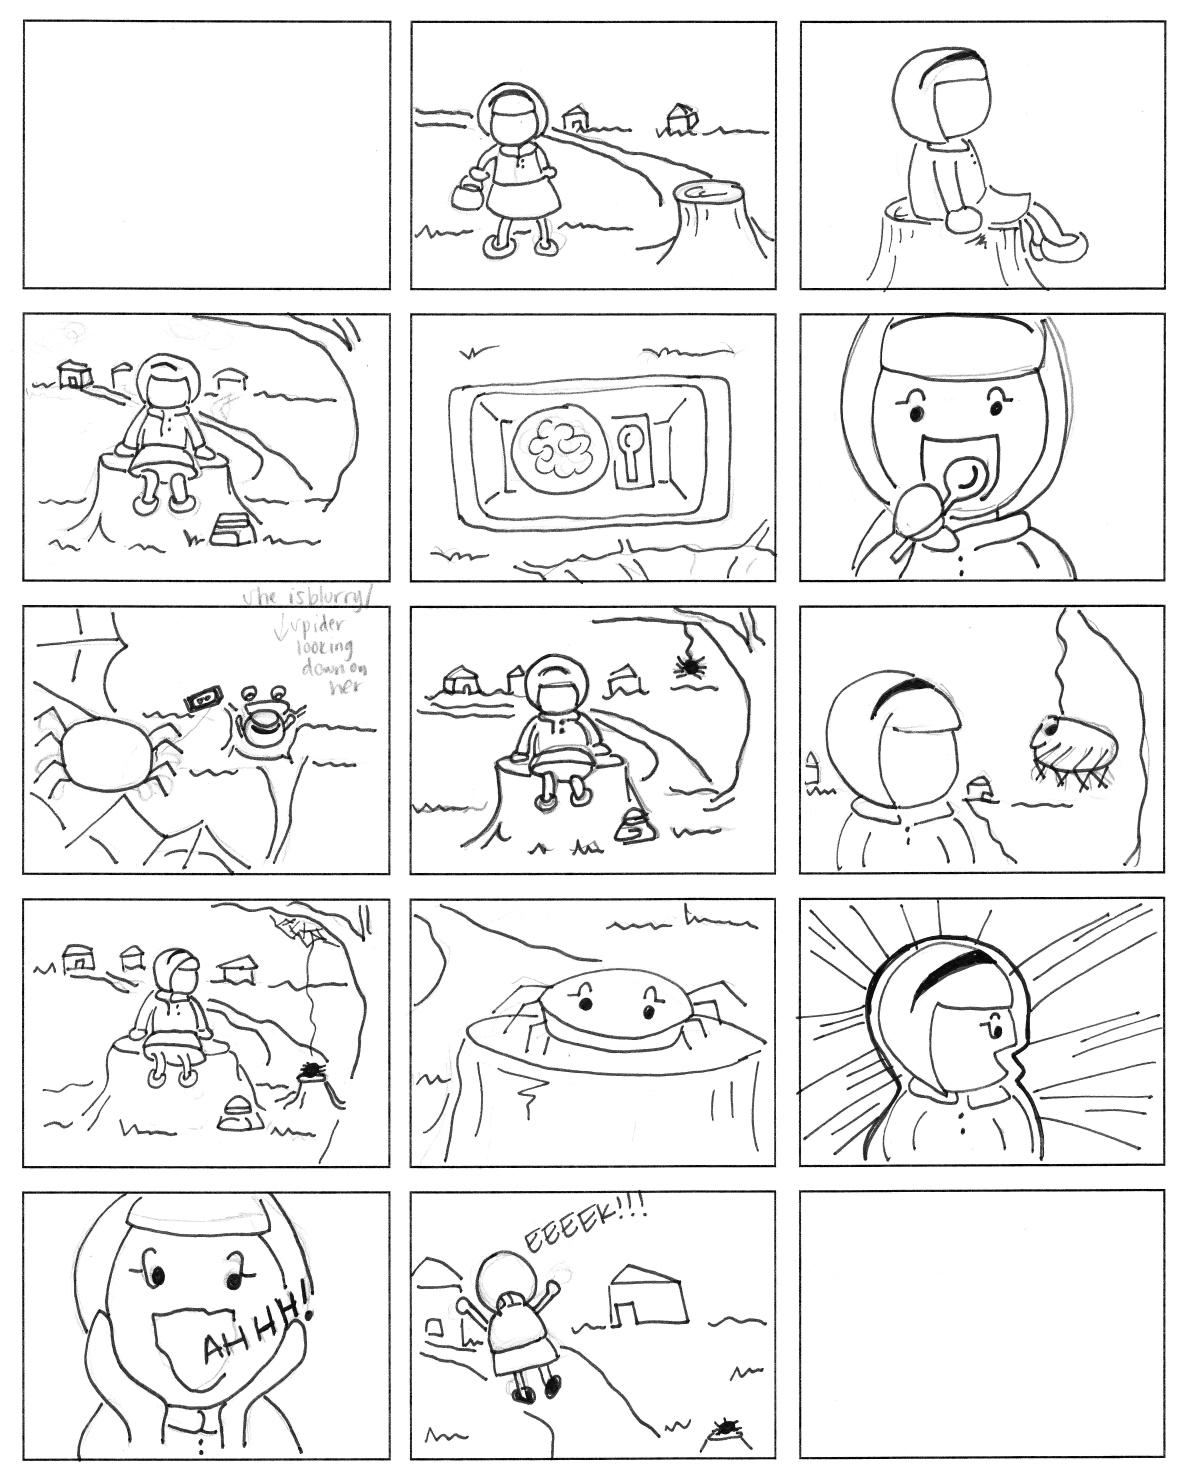 Assignment 5 Nursery Rhyme Storyboard